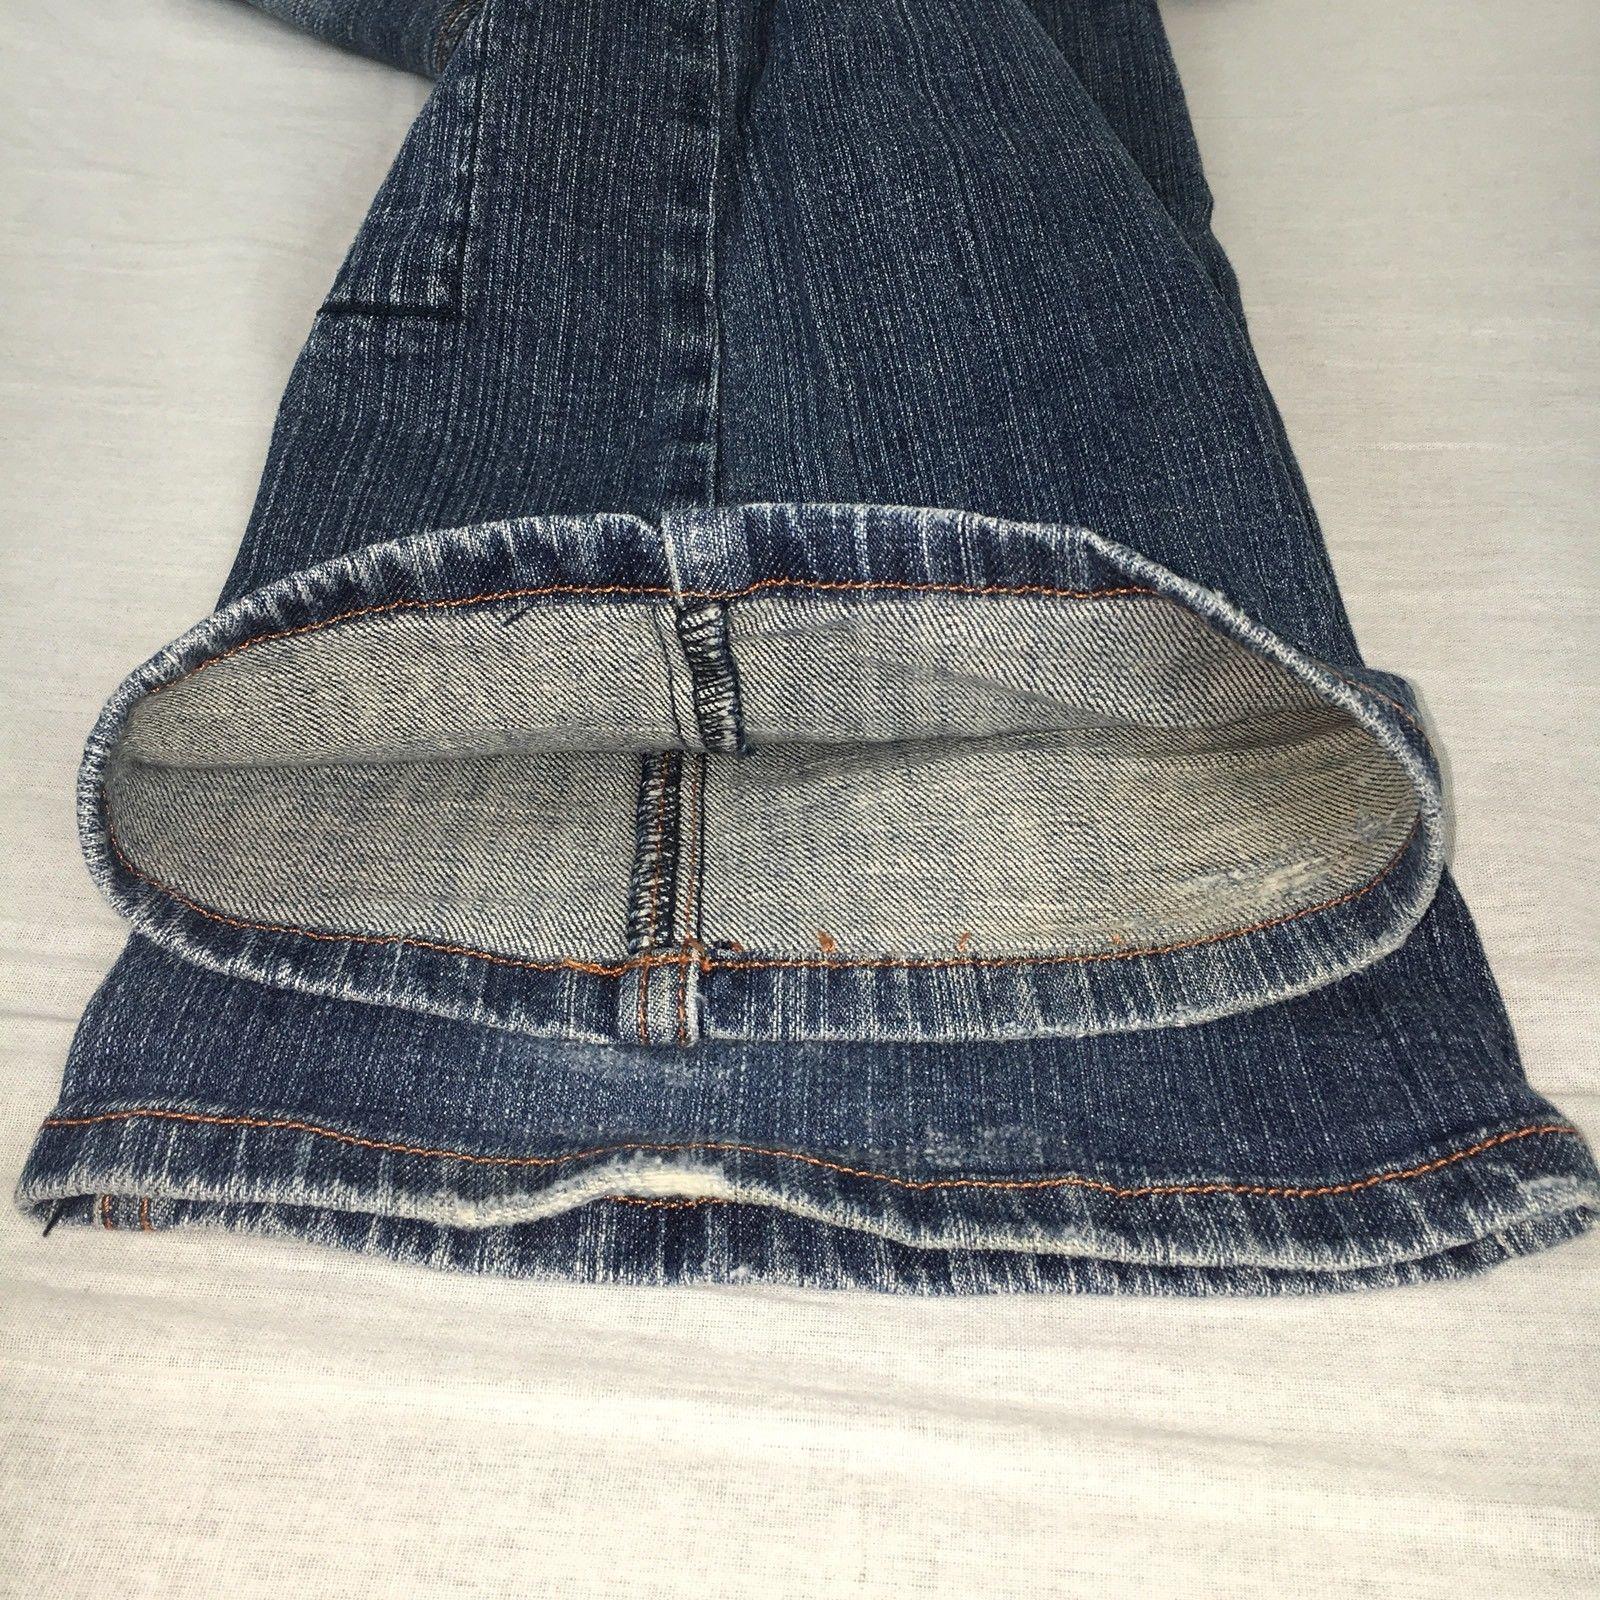 Zana Di Womens Jeans Flare Medium Wash Distressed Fleur De Lis Stretch Size 7